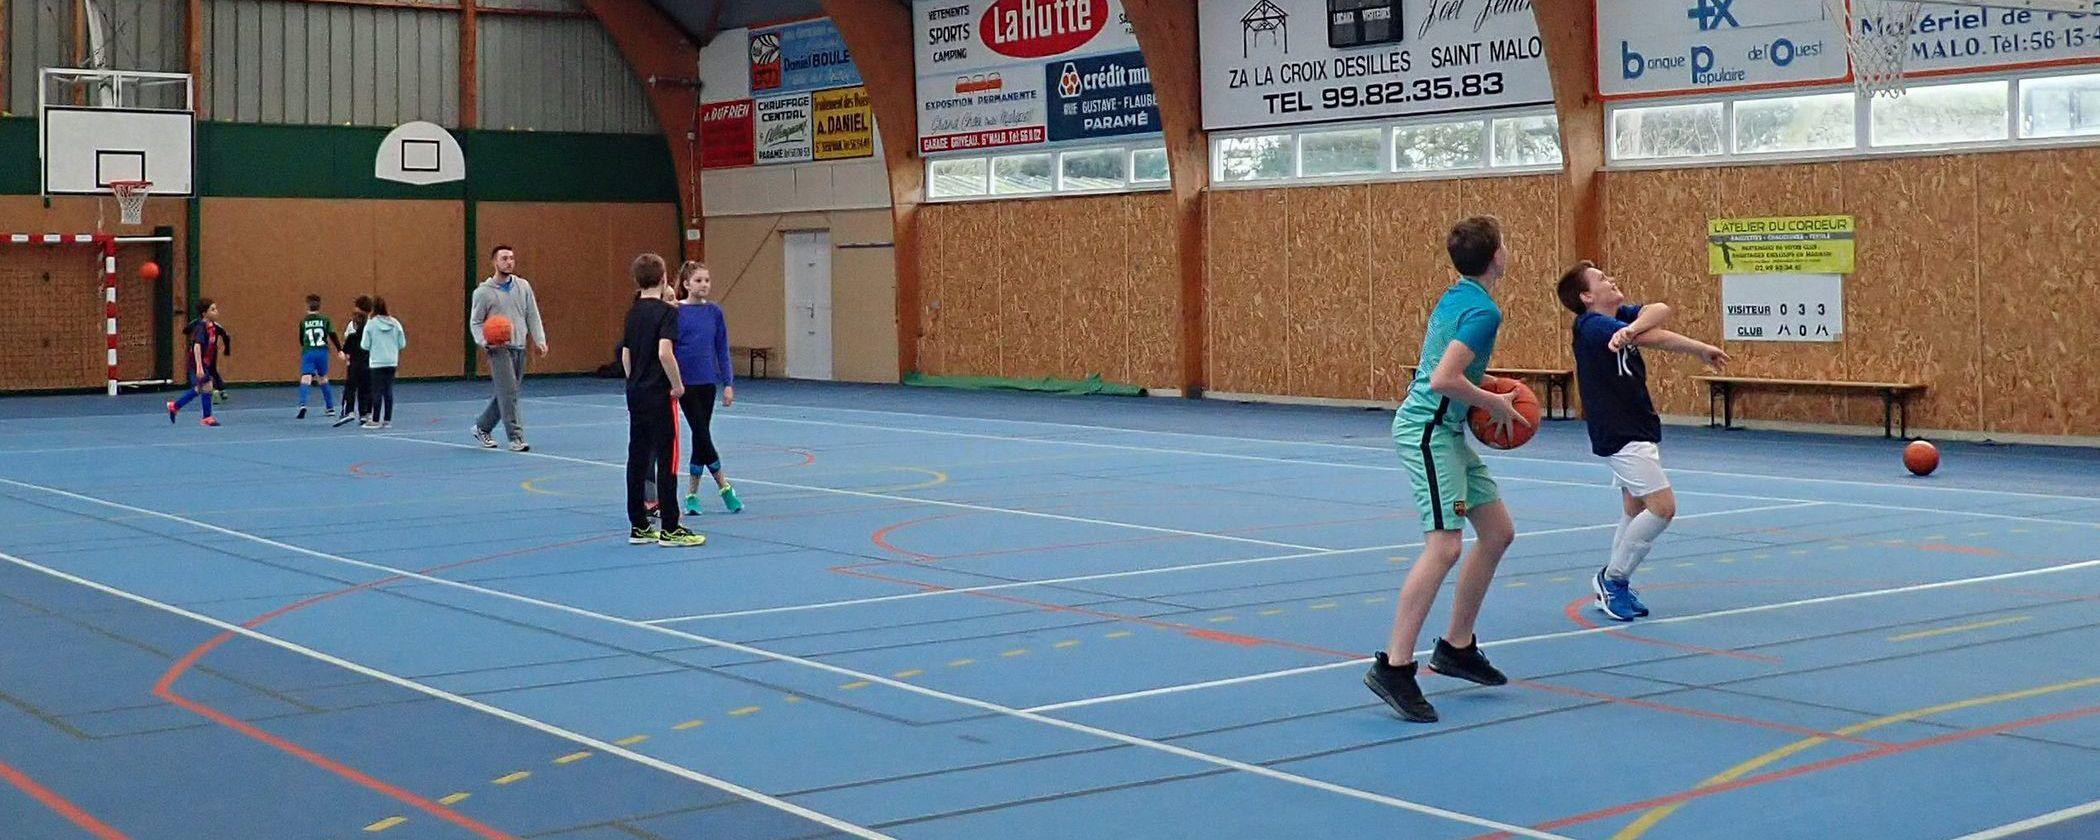 Basket OSEN Saint-Malo